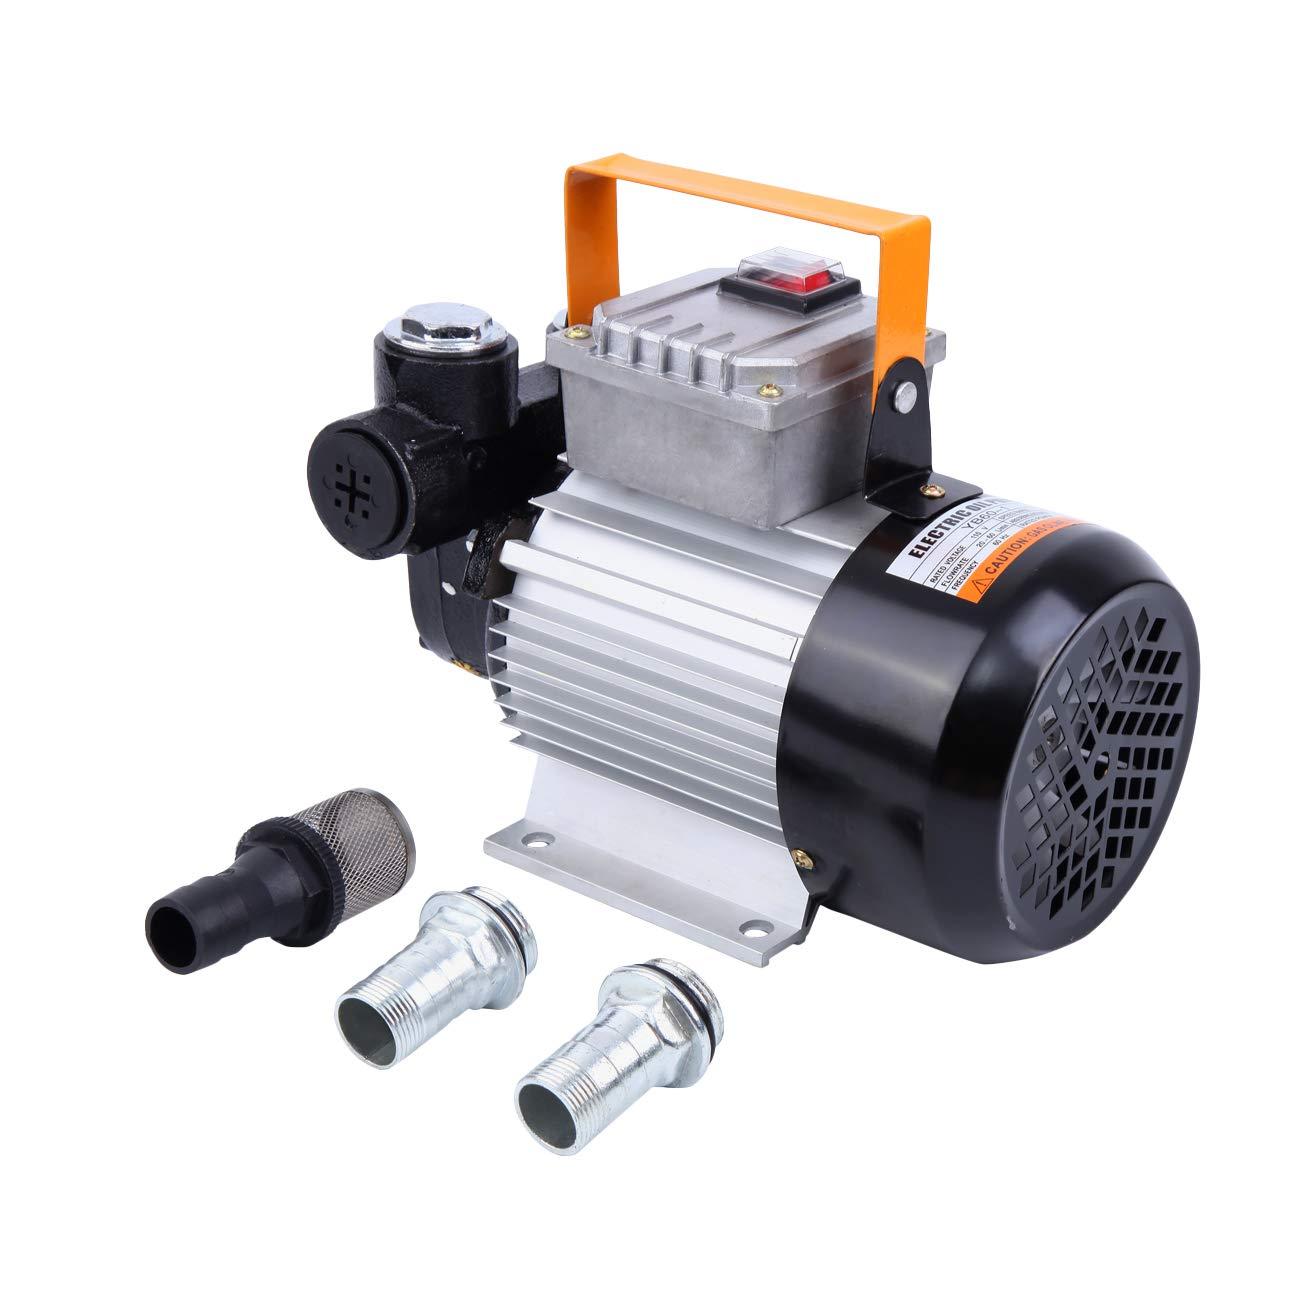 PanelTech Self Prime 16GPM Oil Transfer Pump Diesel Kerosene Biodiesel 550W Pumps 110V PanelTech ltd